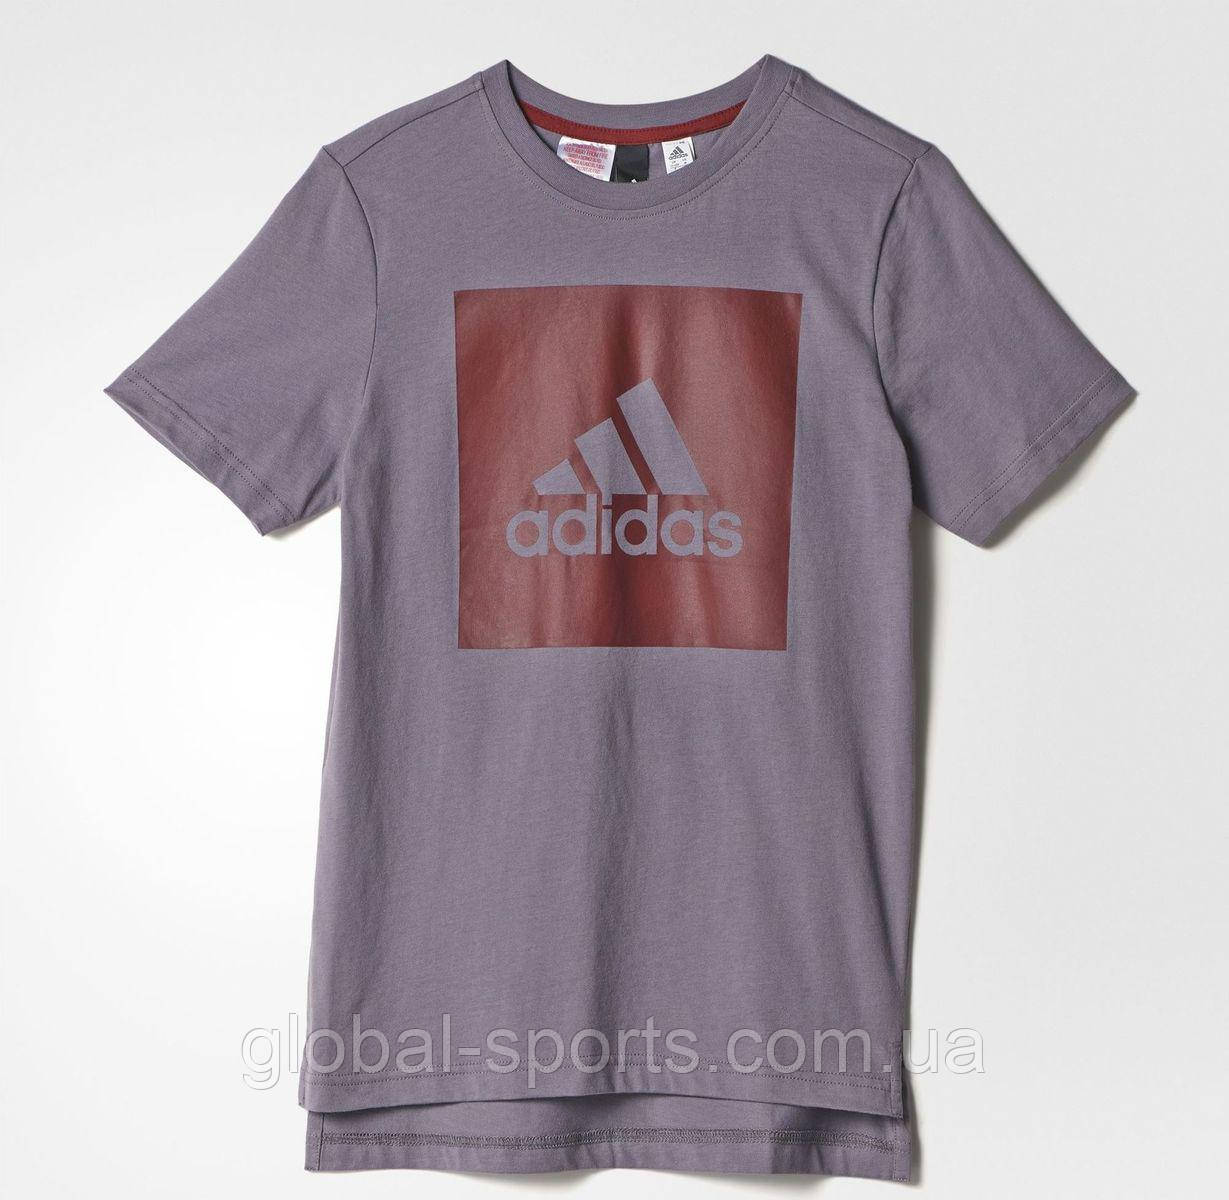 7646ea8834ee Детская футболка Adidas Performance YB LOGO TEE (Артикул BJ9347) - Global  Sport в